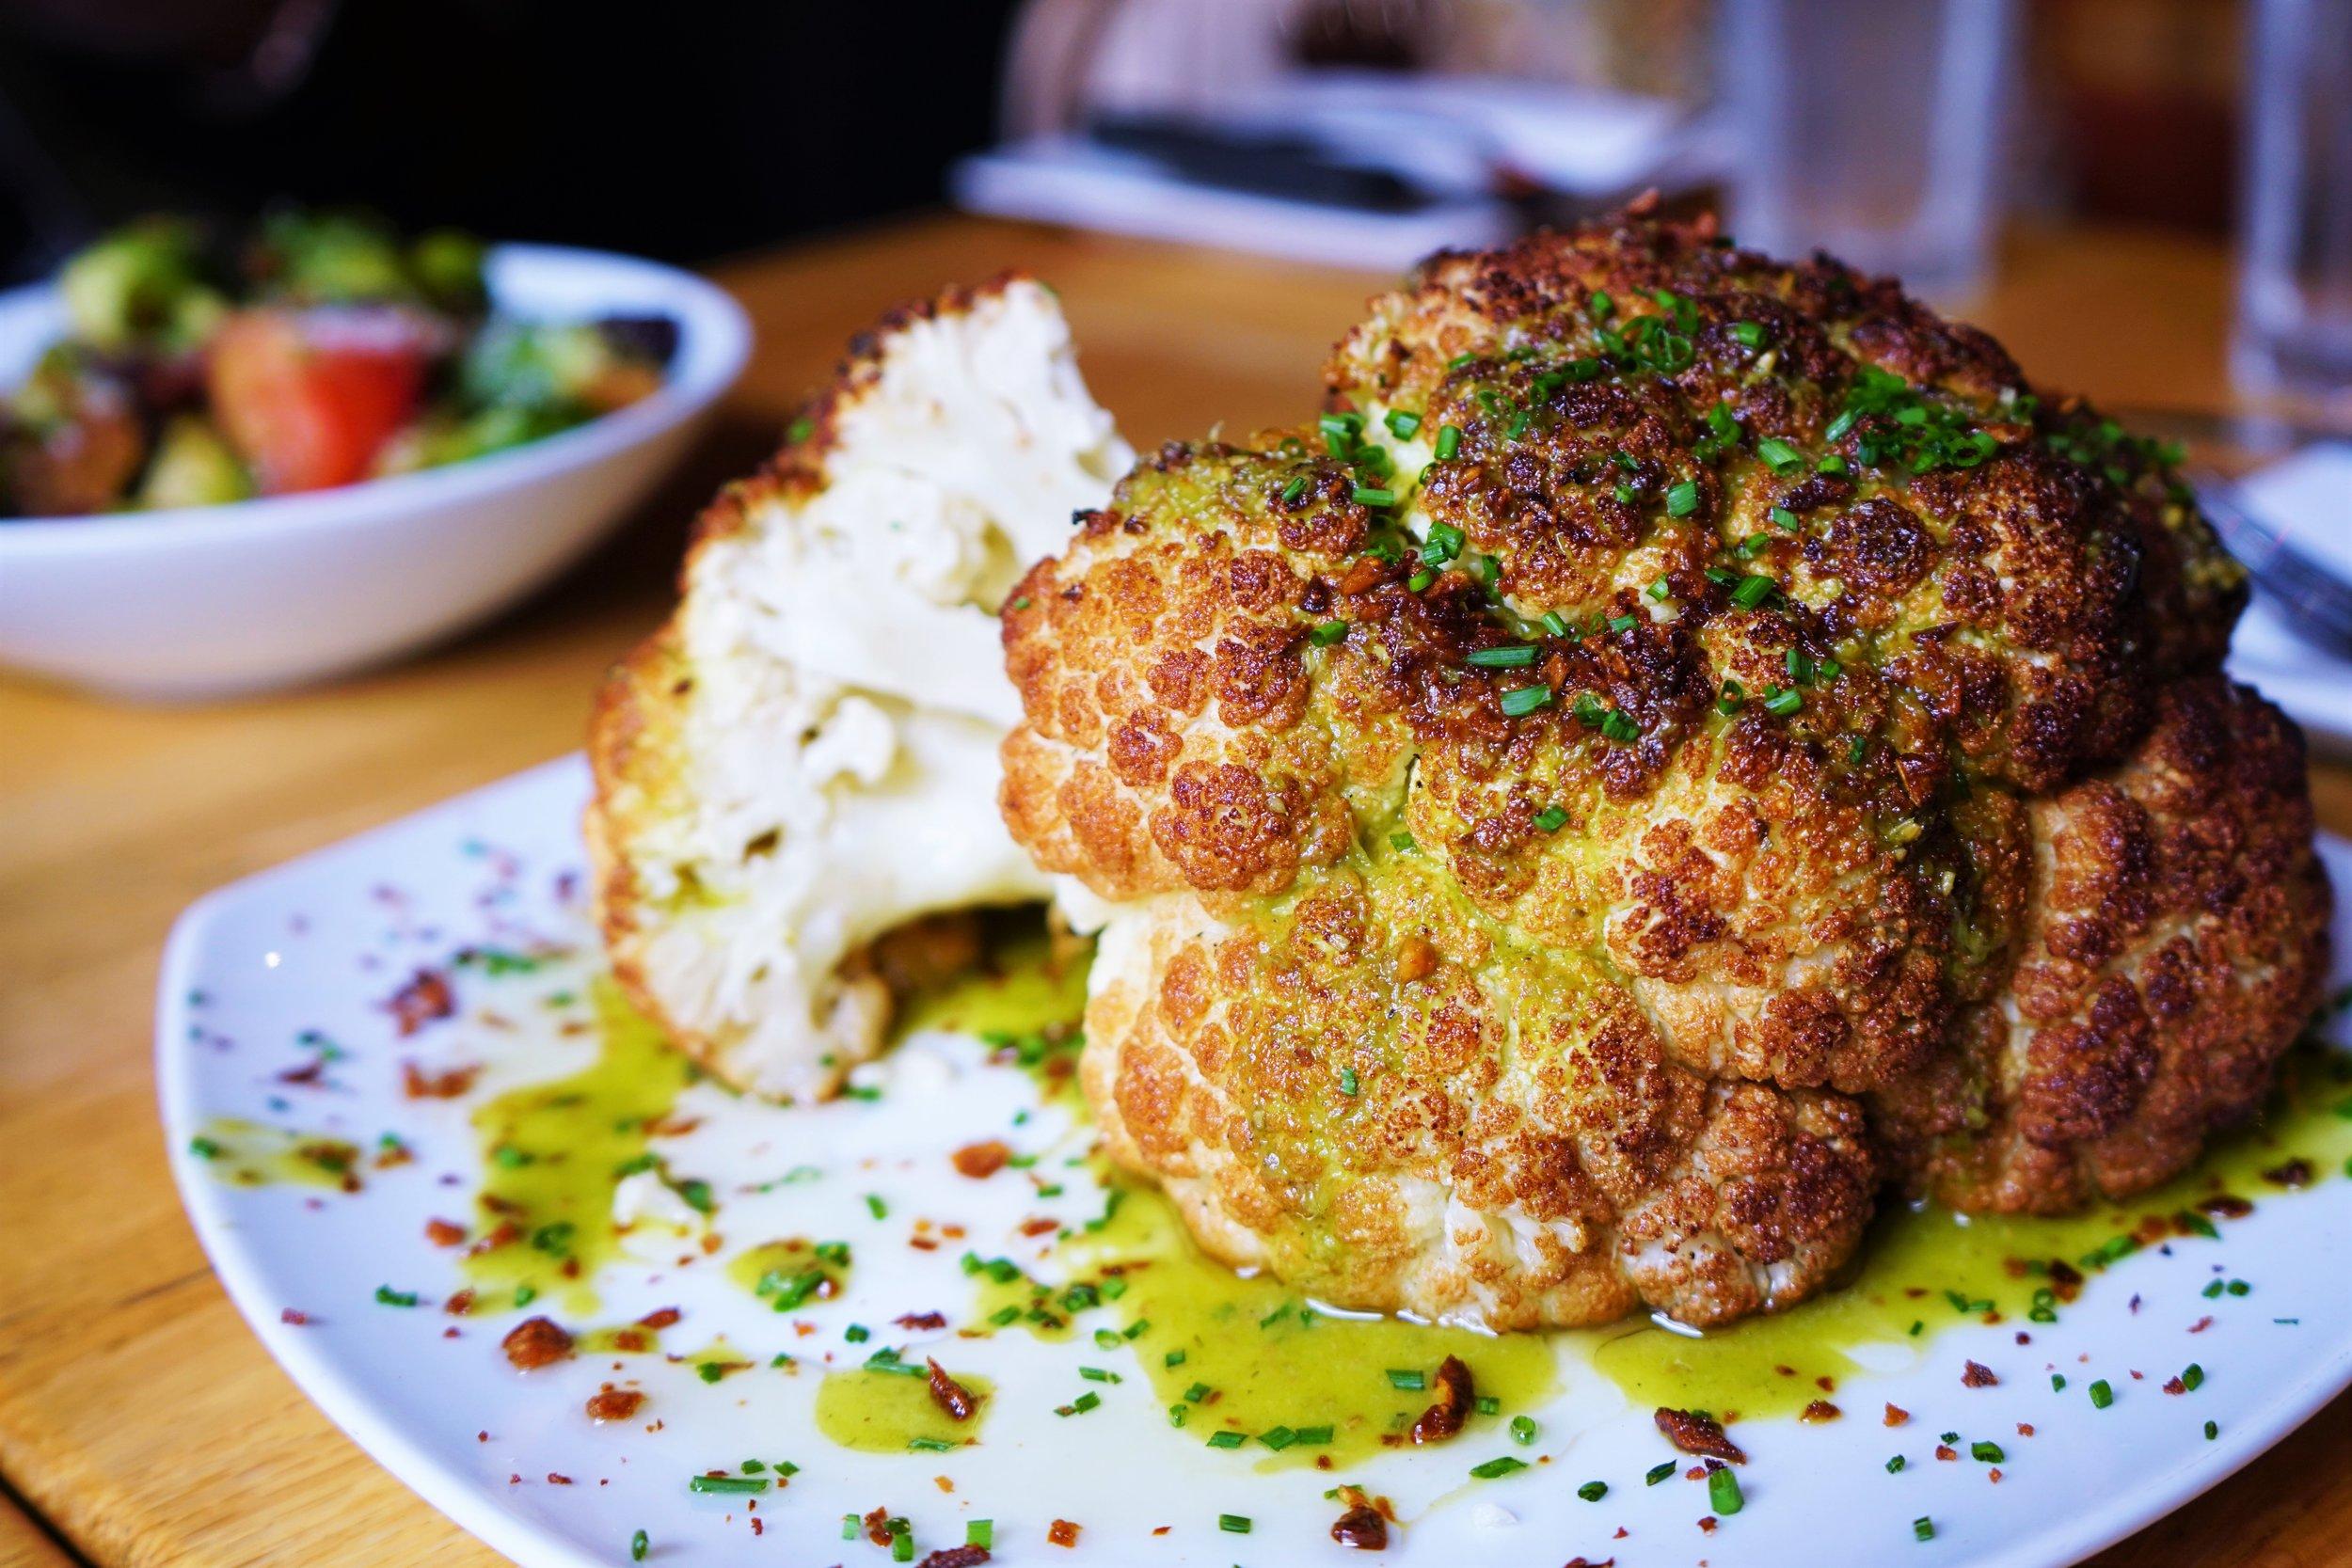 Cauliflower with Crispy Garlic, Citrus & Cumin Vinaigrette at Tip Tap Room in Boston